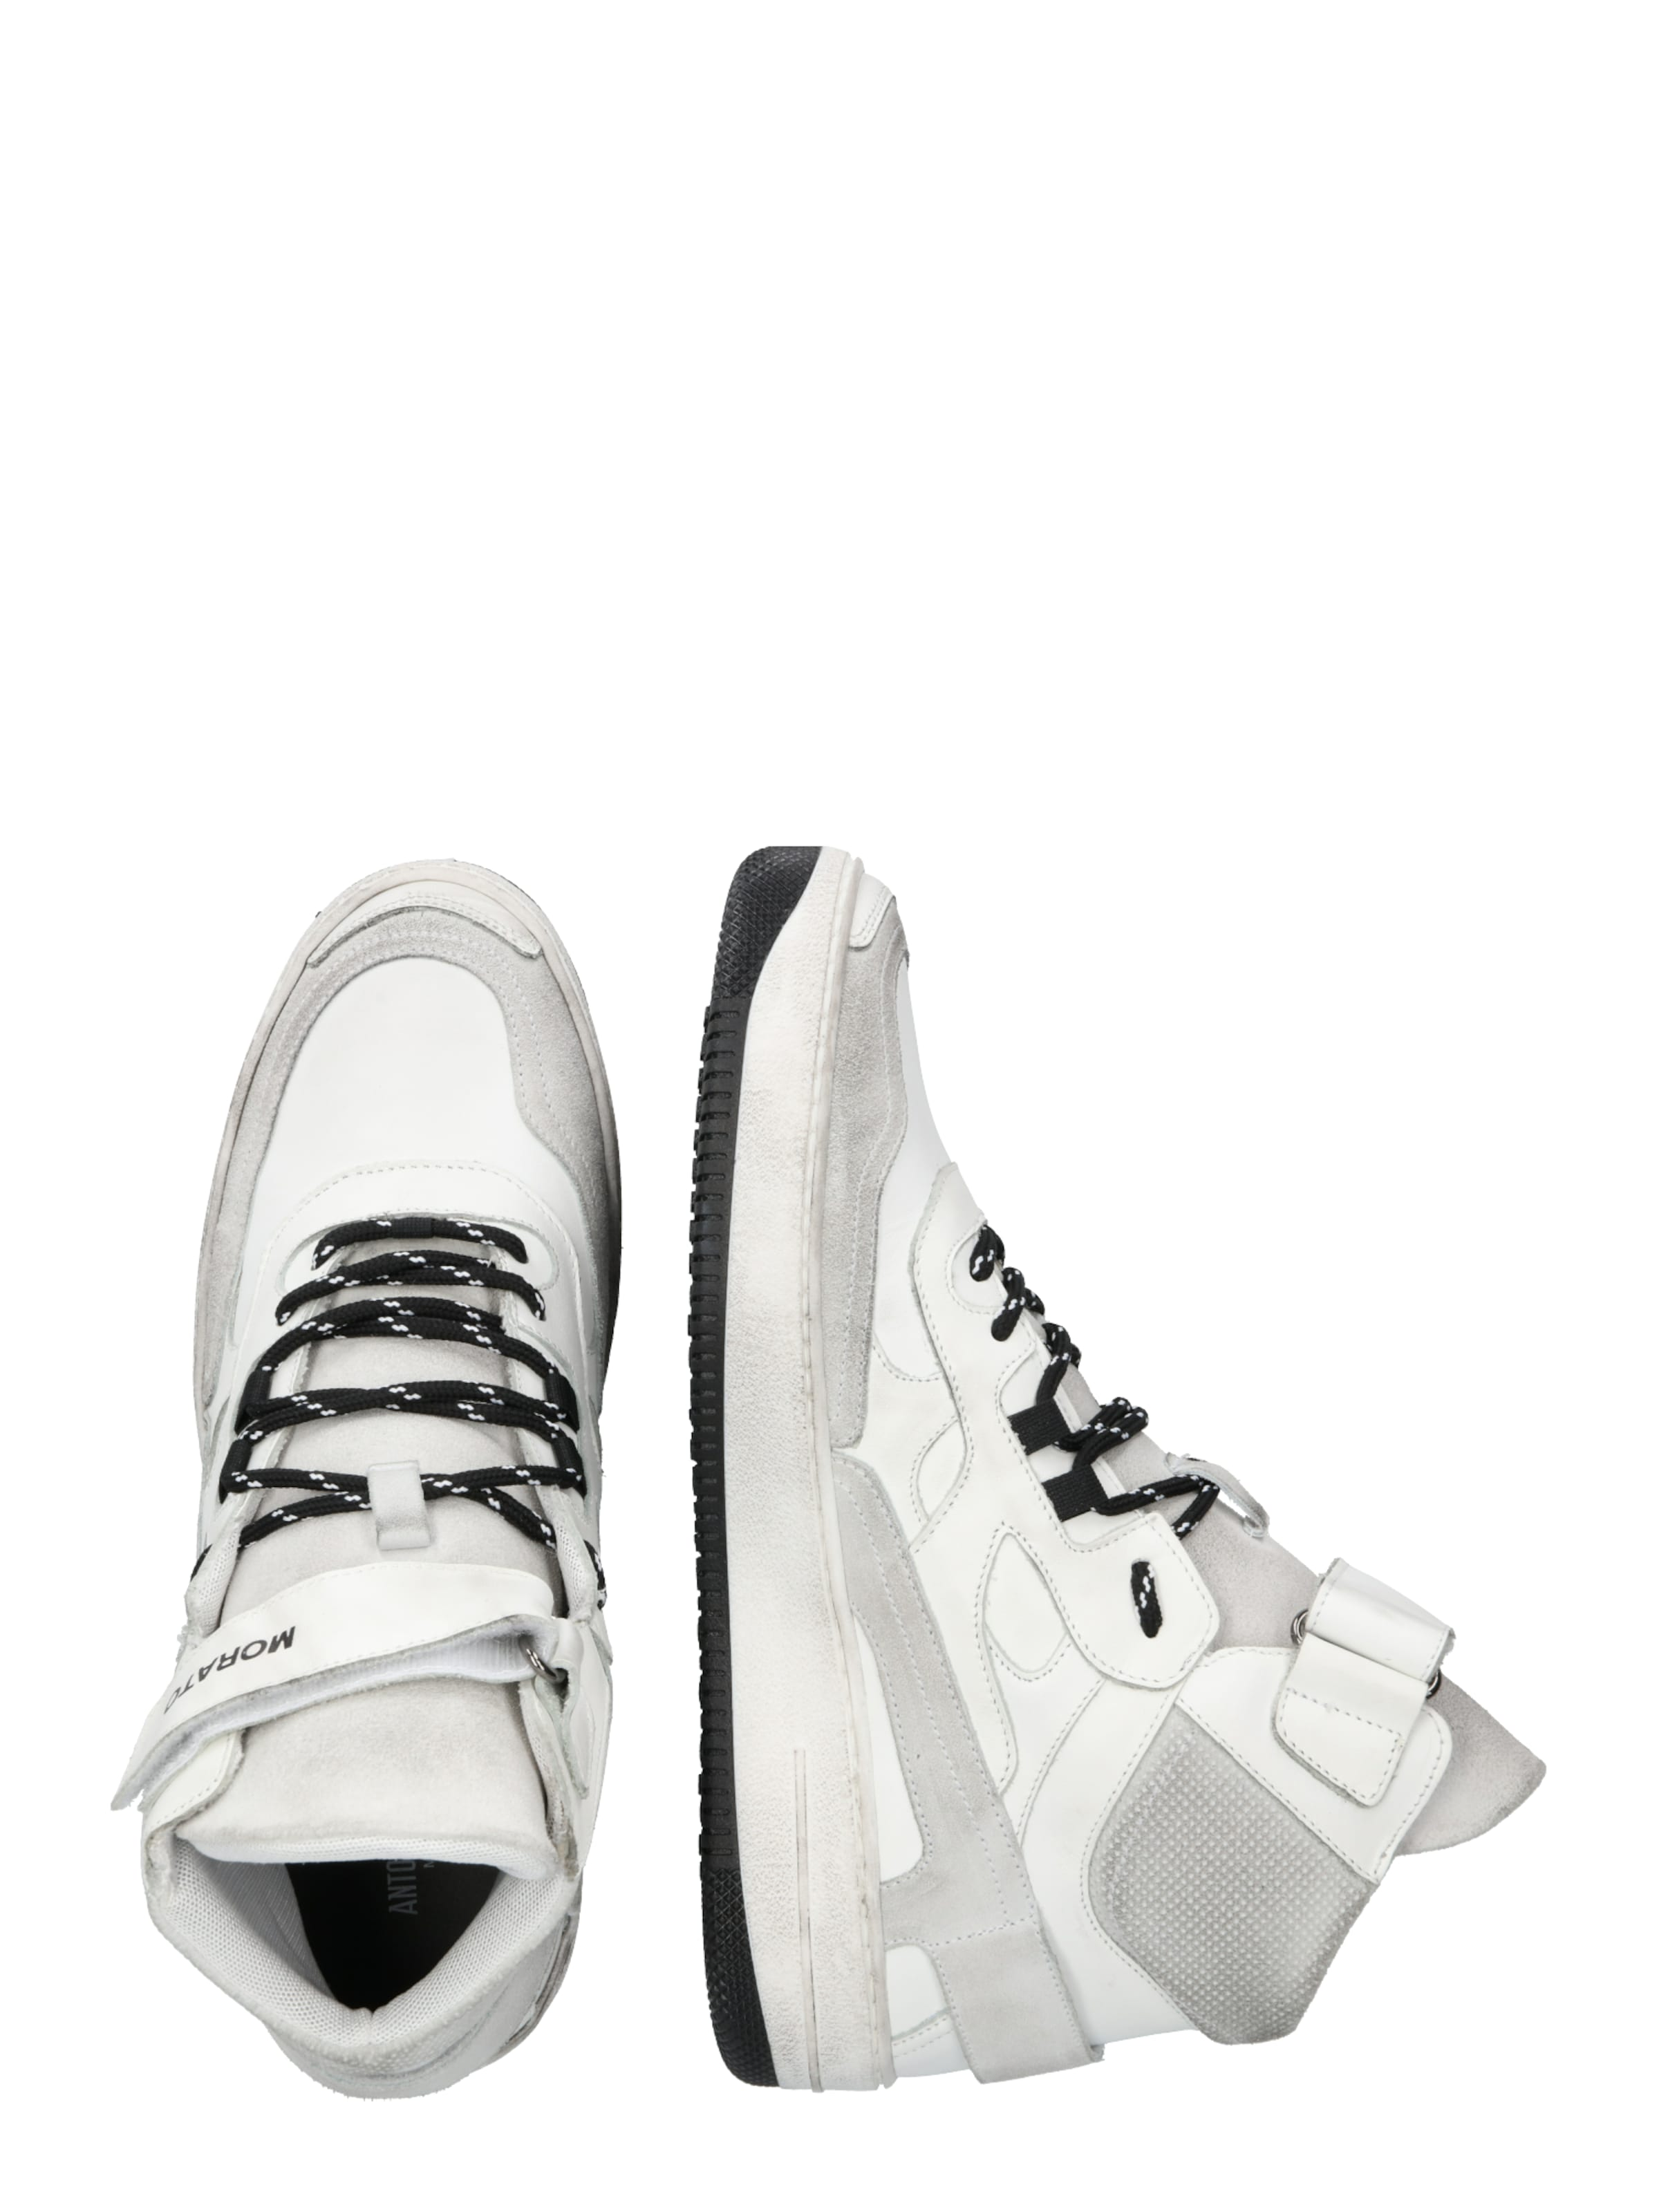 Antony GrauWeiß Morato In Sneaker 'stroke' 8wkOXn0P